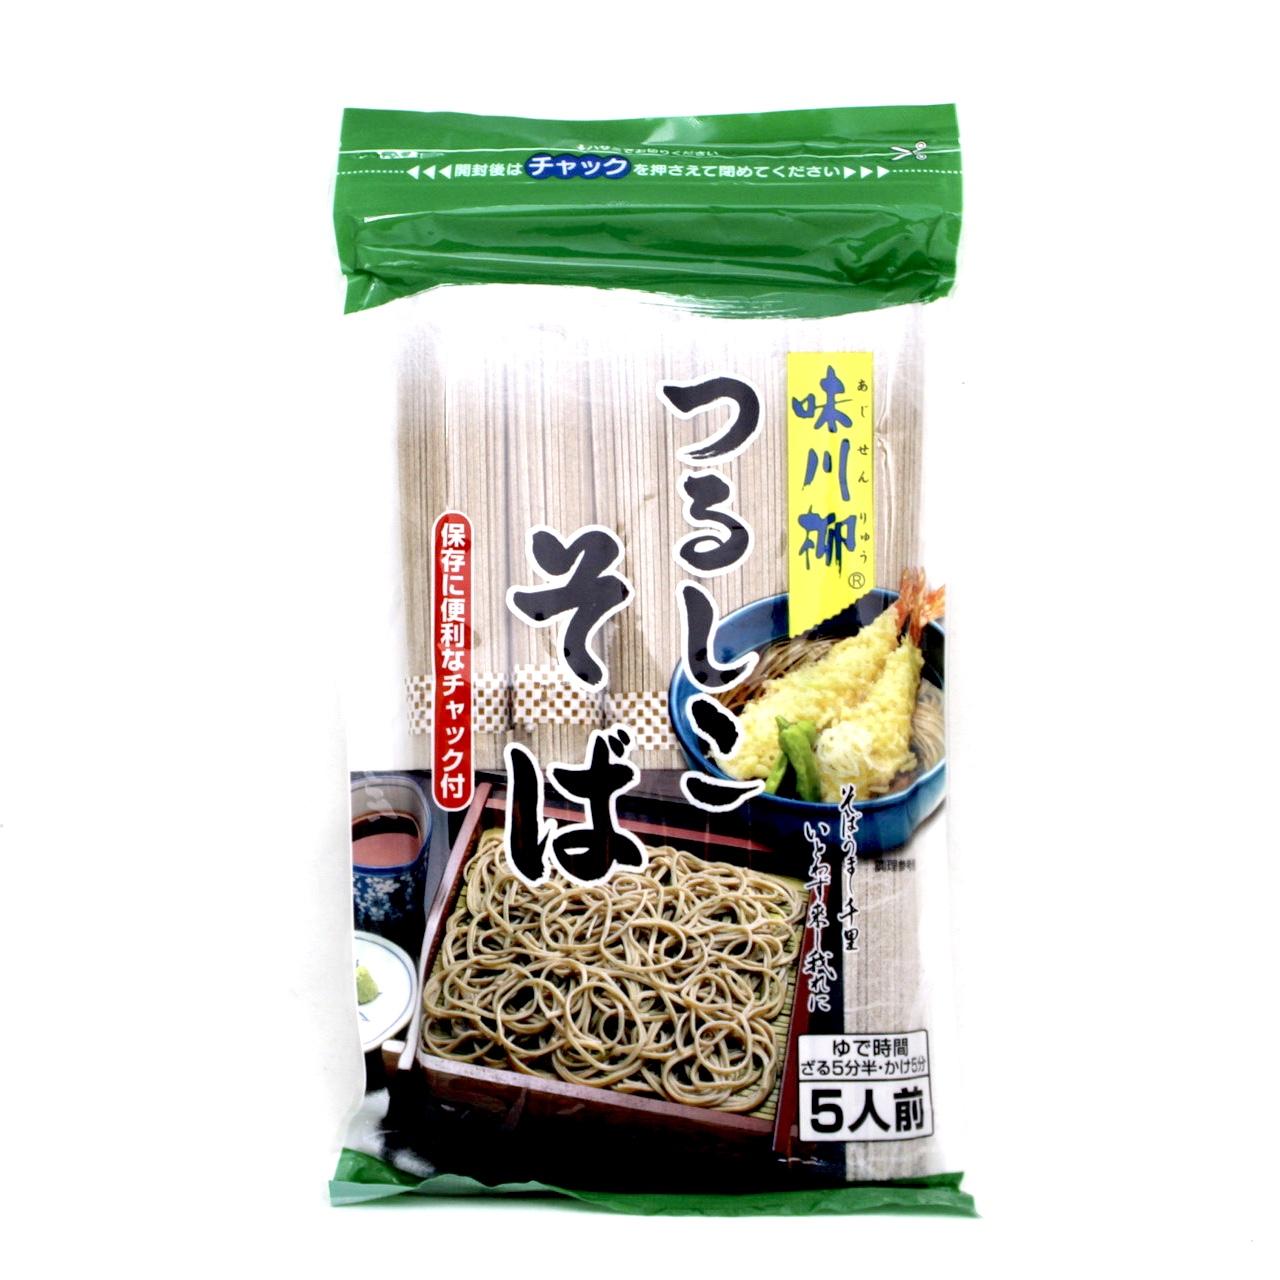 SHIGENO TSURUCHIKO SOBA 400g